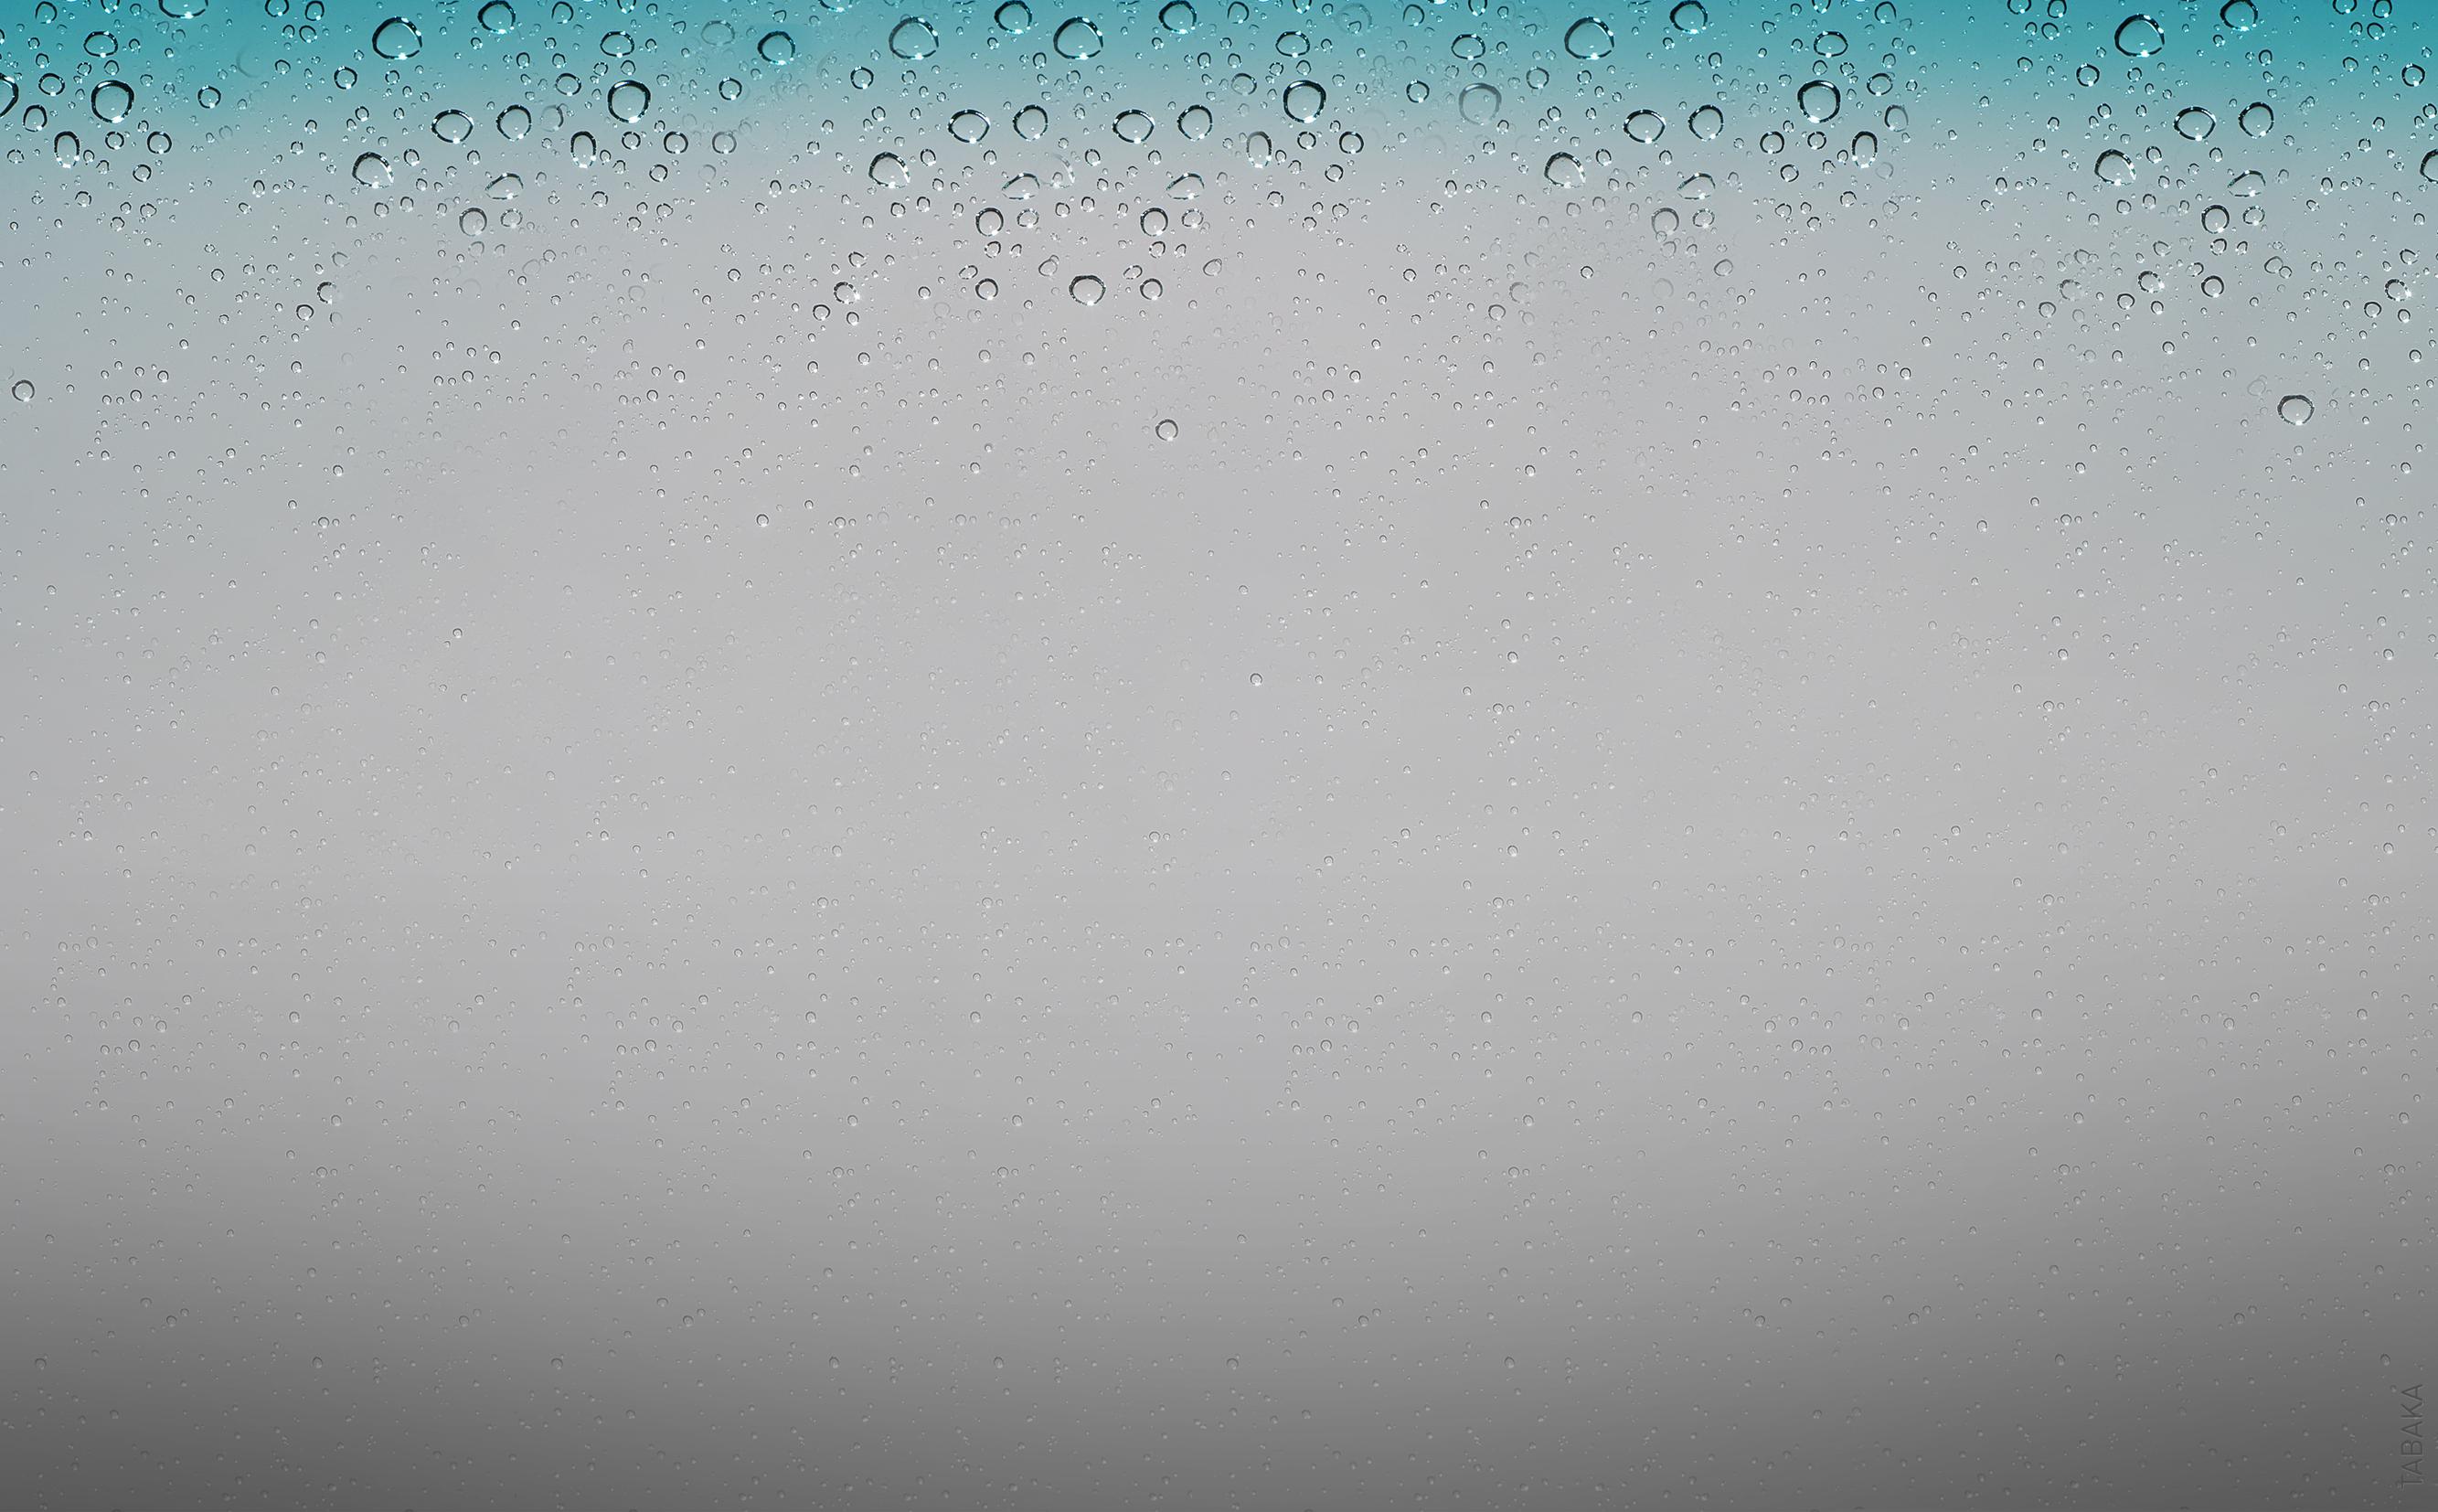 Ios 7 Iphone Wallpaper: IOS 5 Original Wallpaper